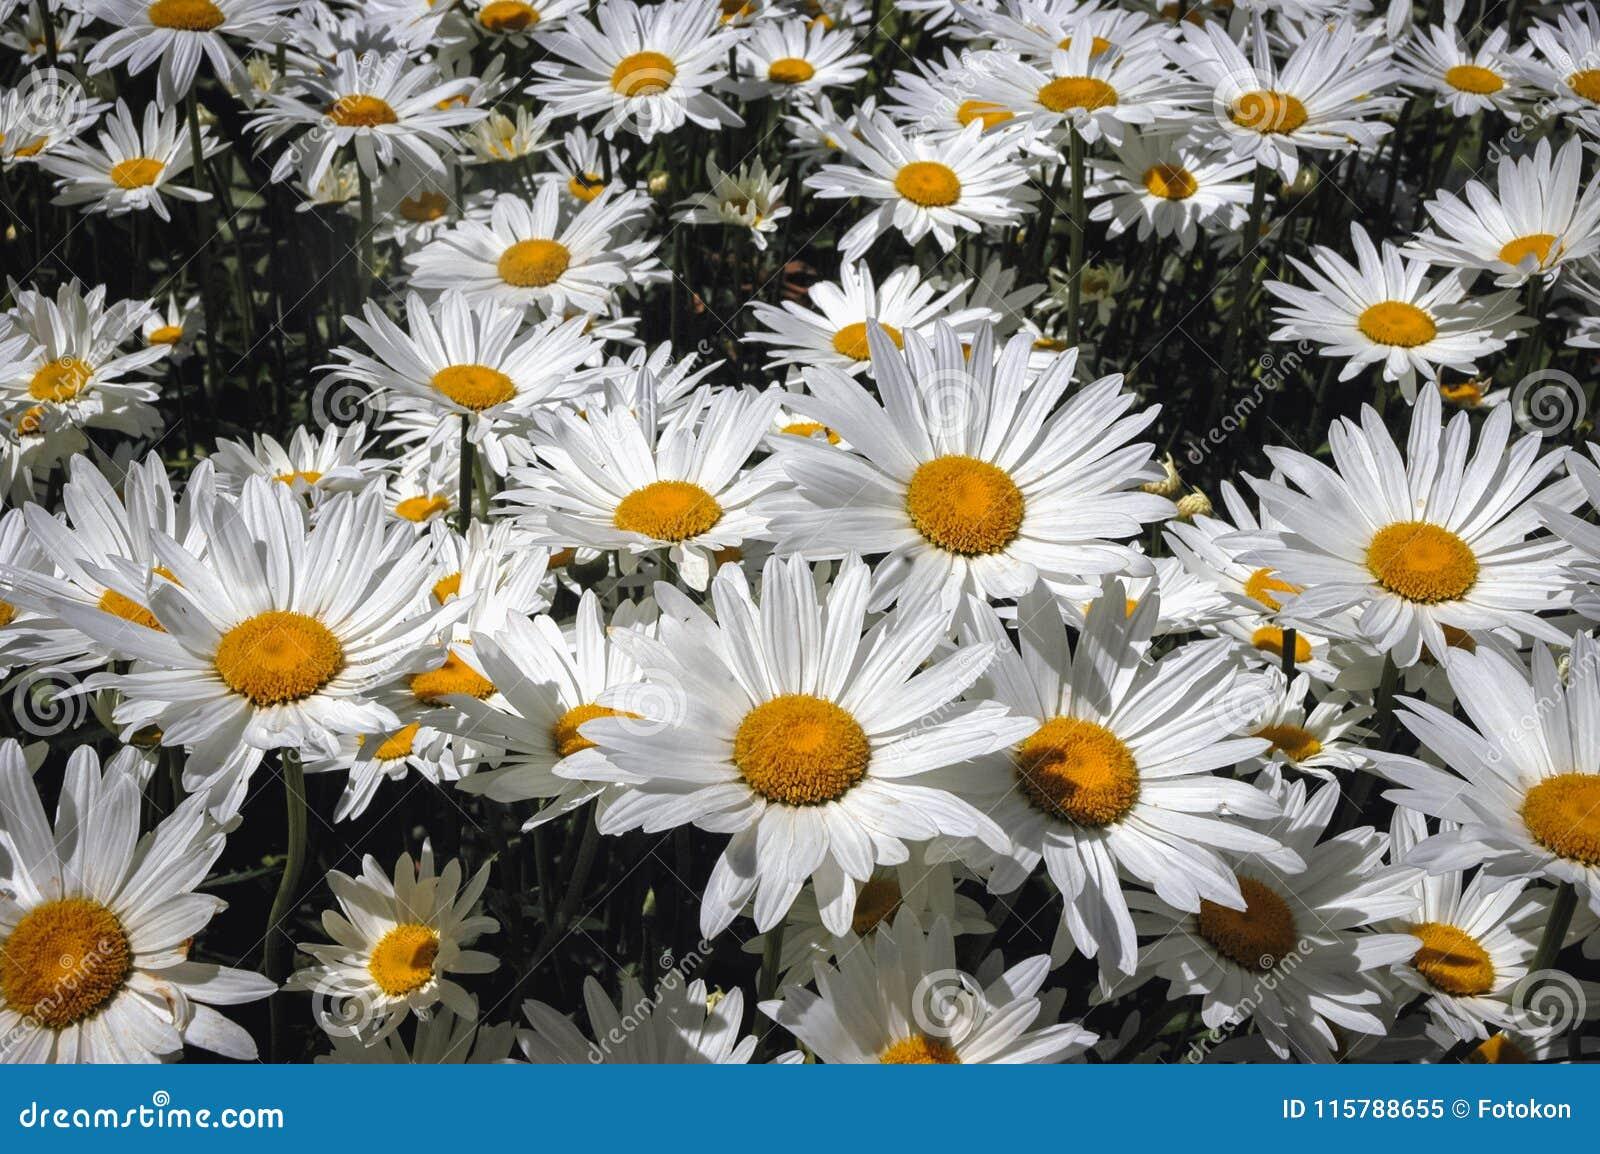 Shasta Daisies Flowers Stock Image Image Of Leucanthemum 115788655